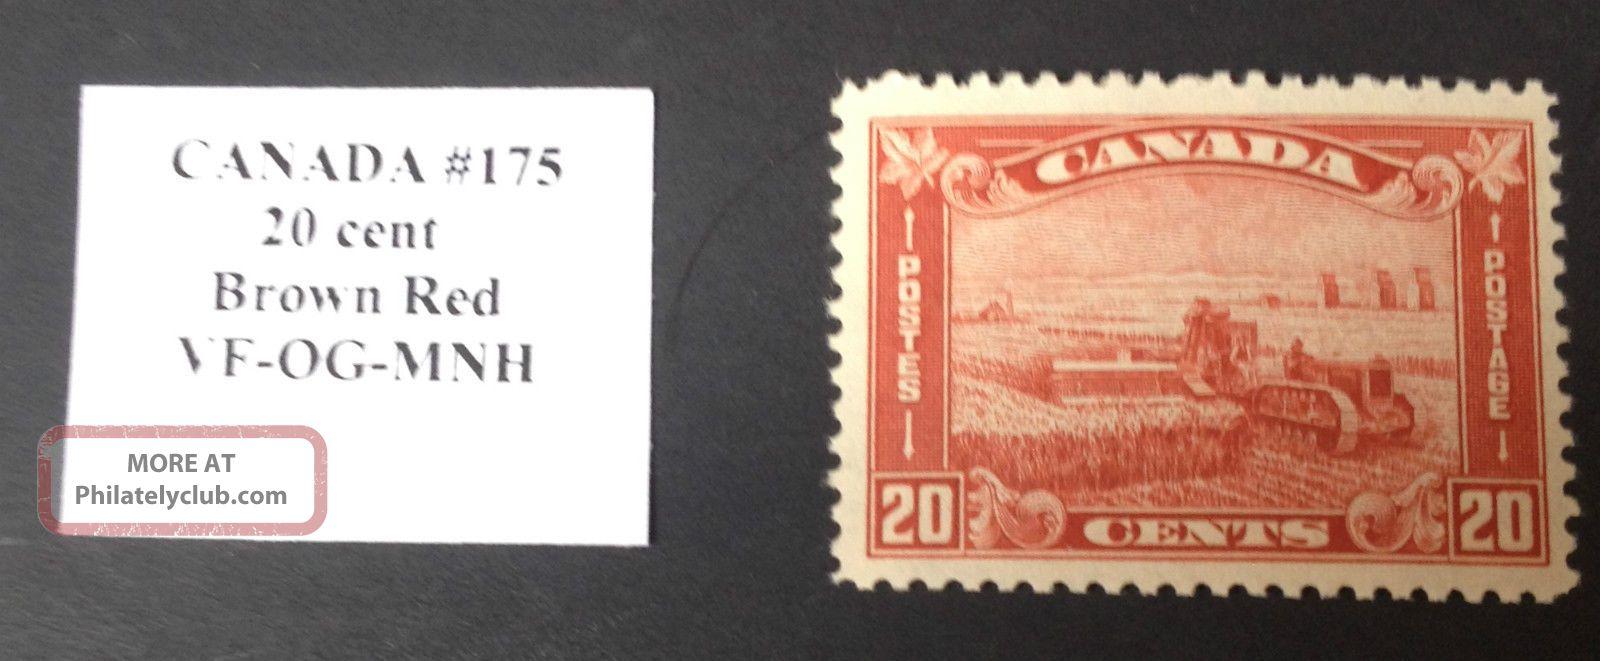 Canada Stamp 175 Vf Canada photo